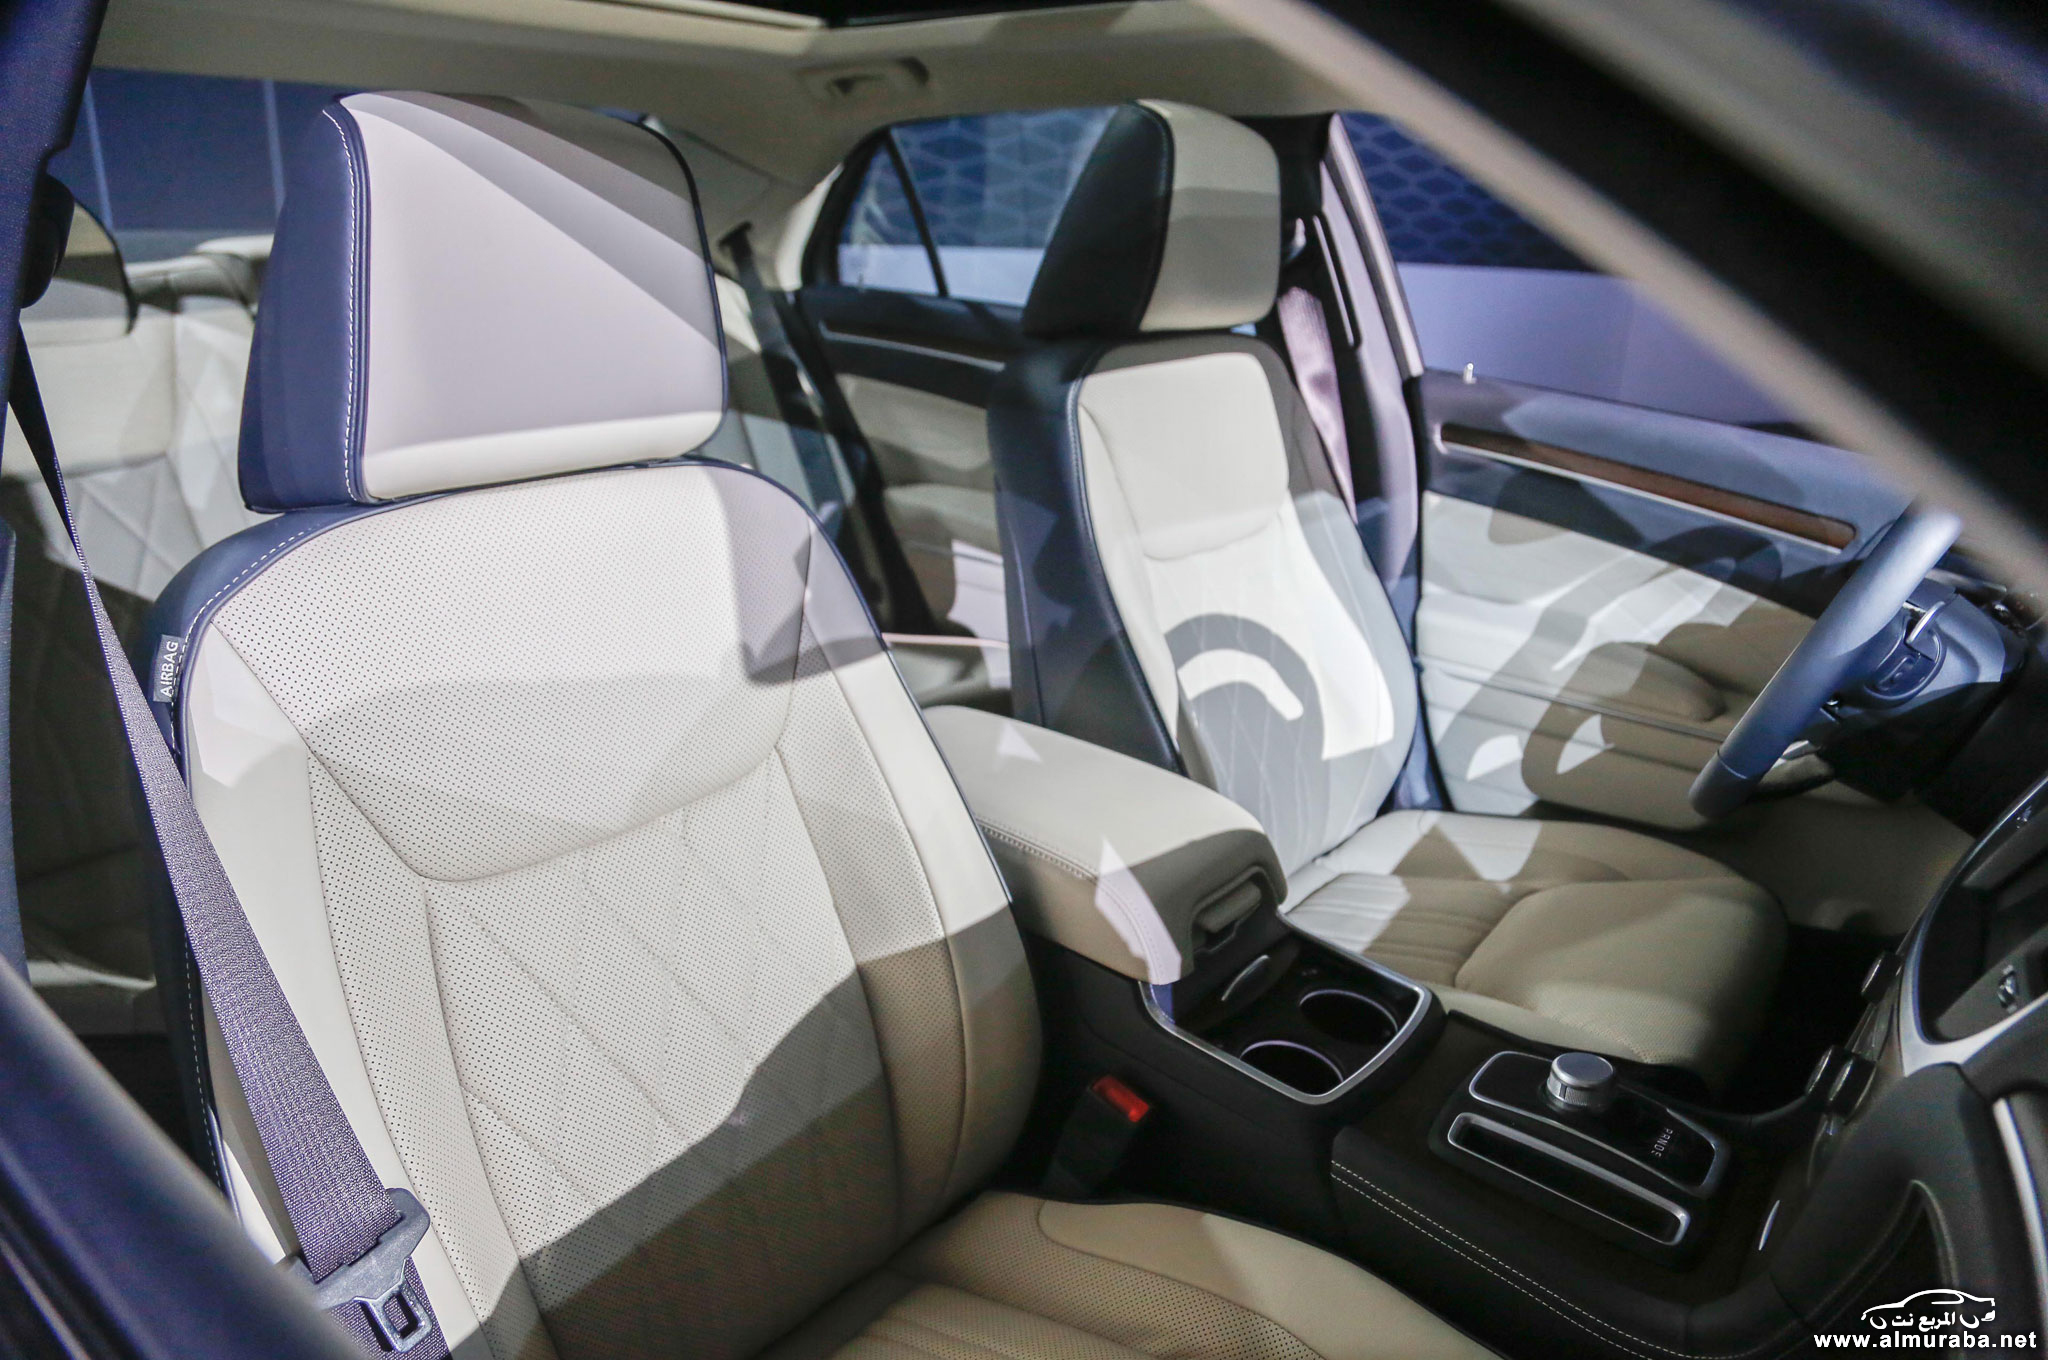 2015-chrysler-300-interior-seats